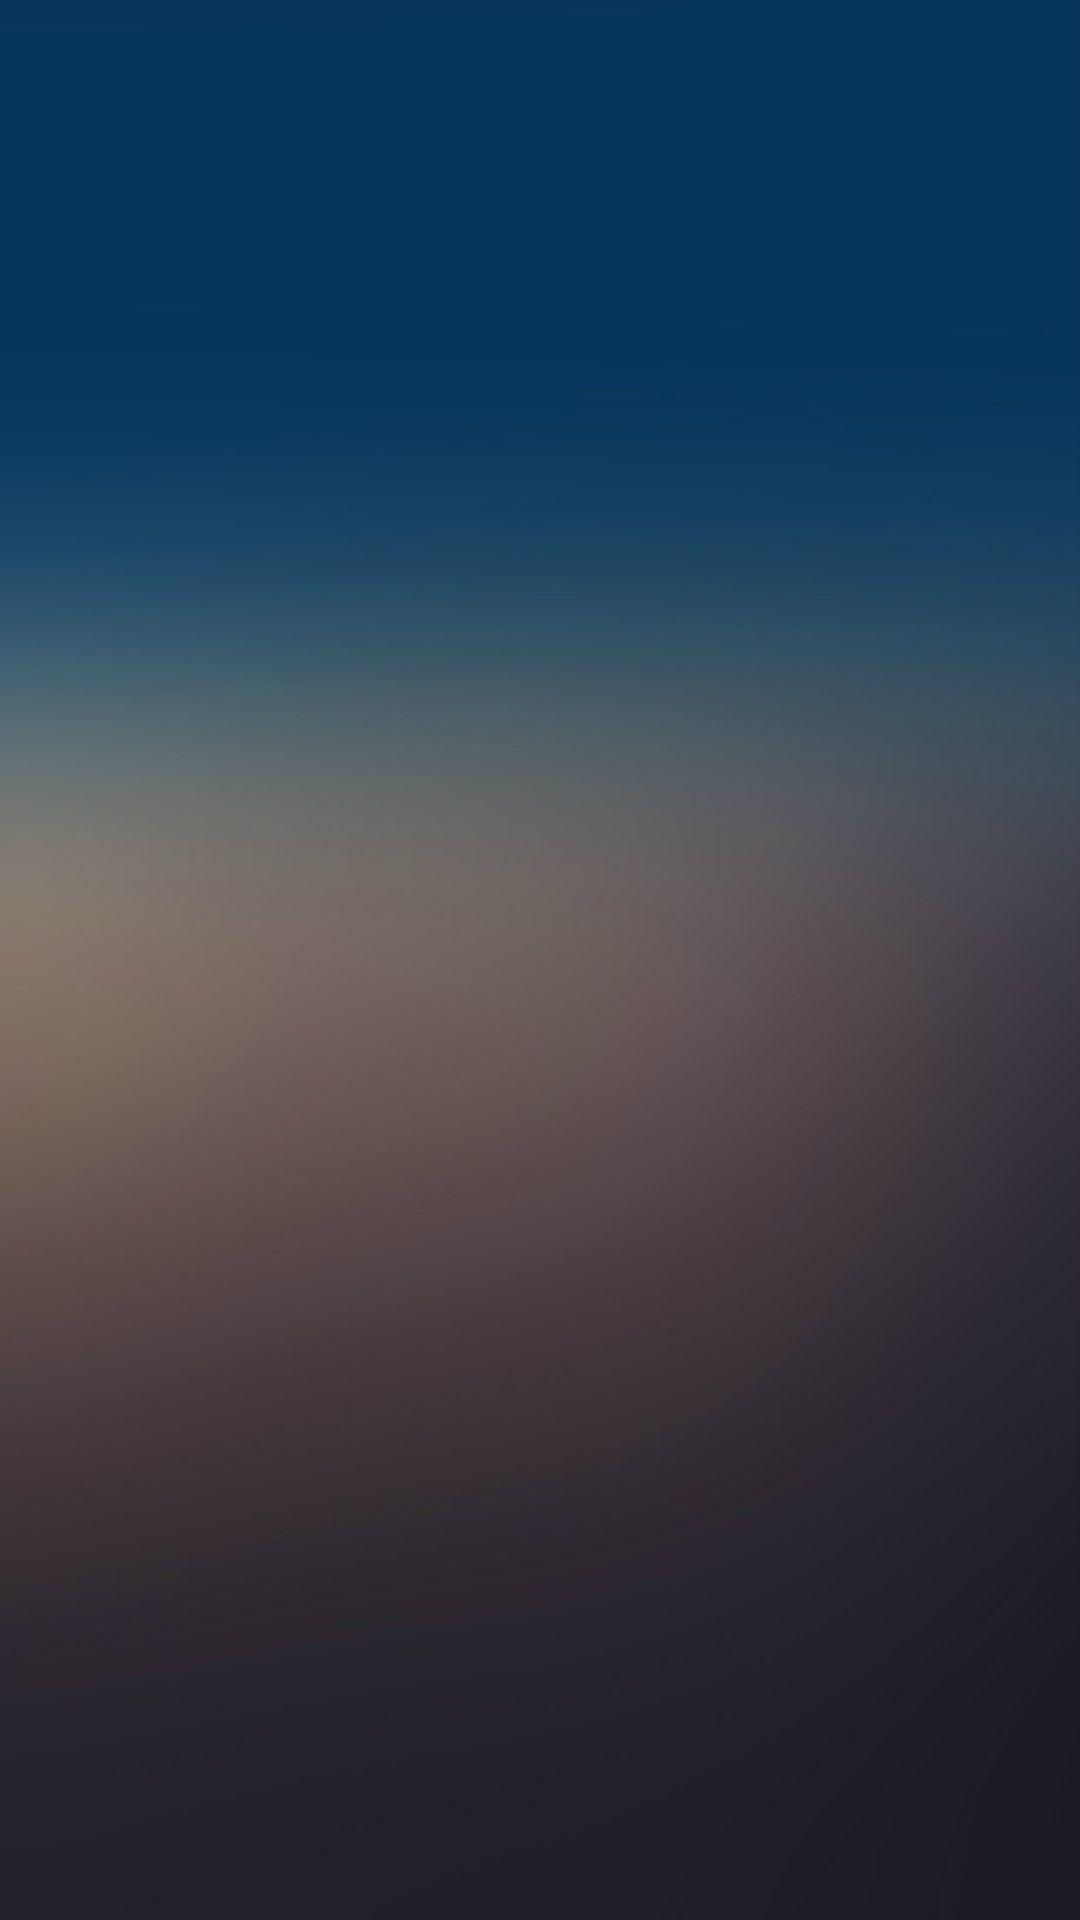 Dark Night Gradation Blur Iphone  Plus Wallpaper